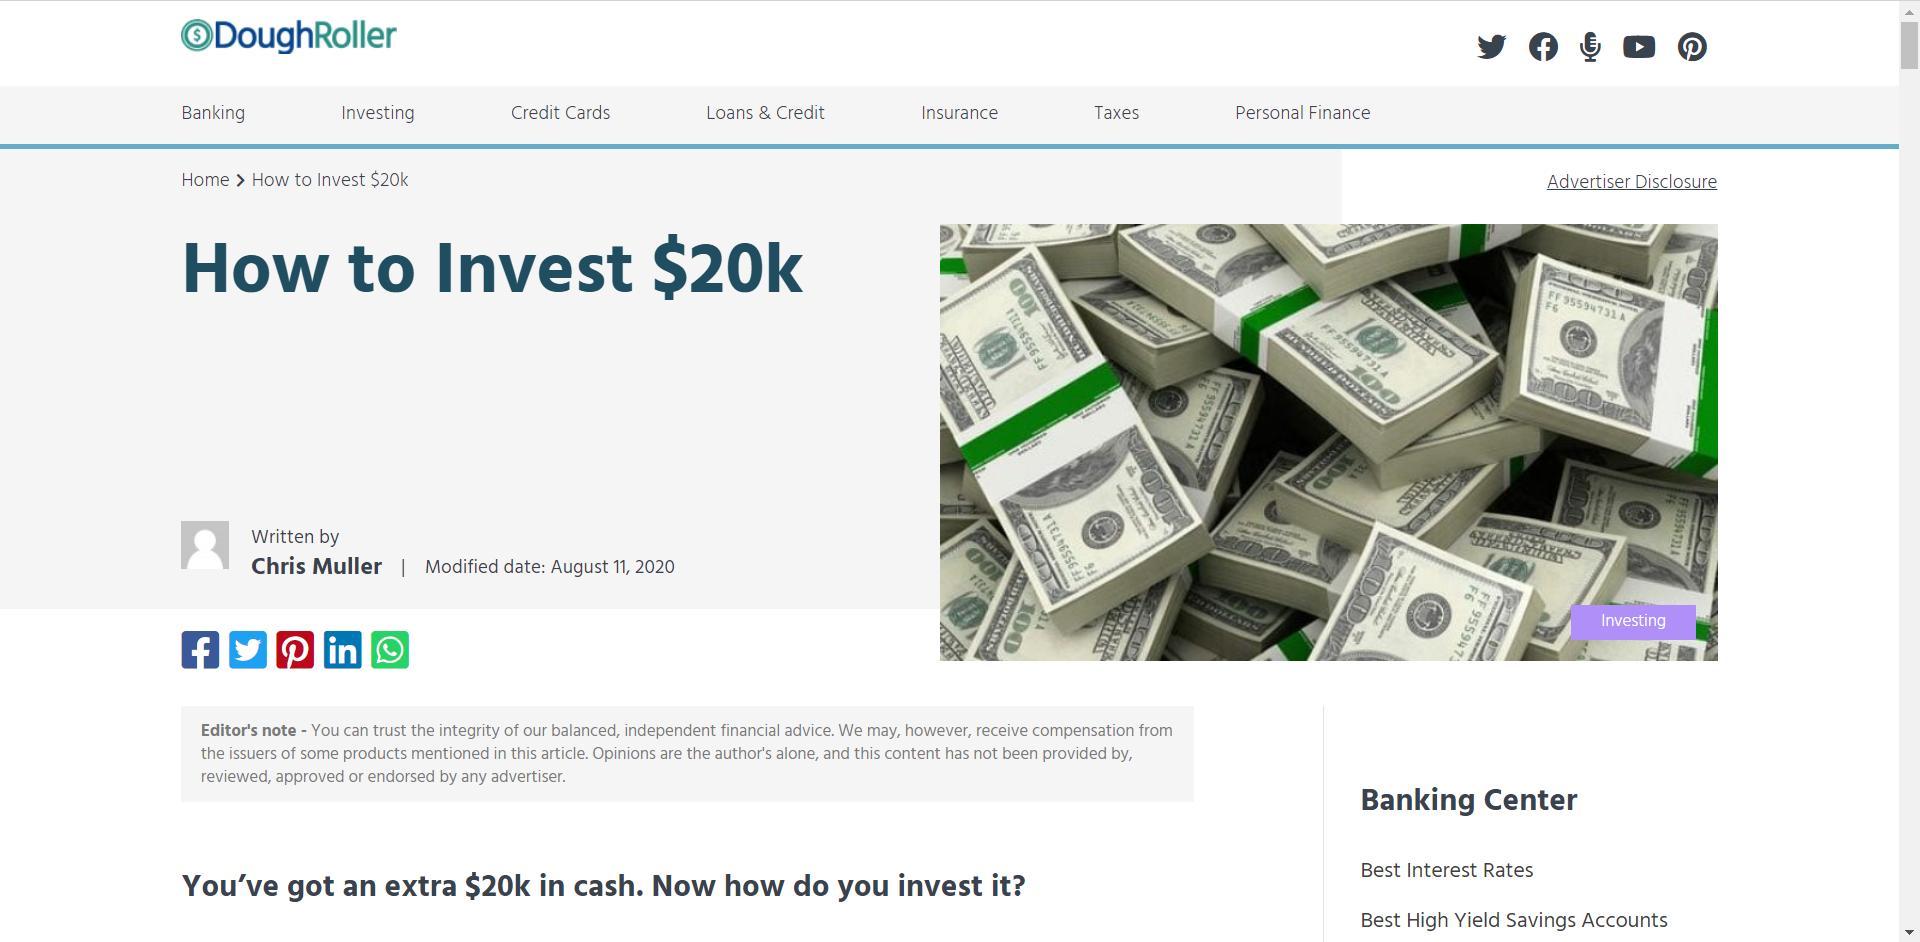 DoughRoller-How to Invest 20K